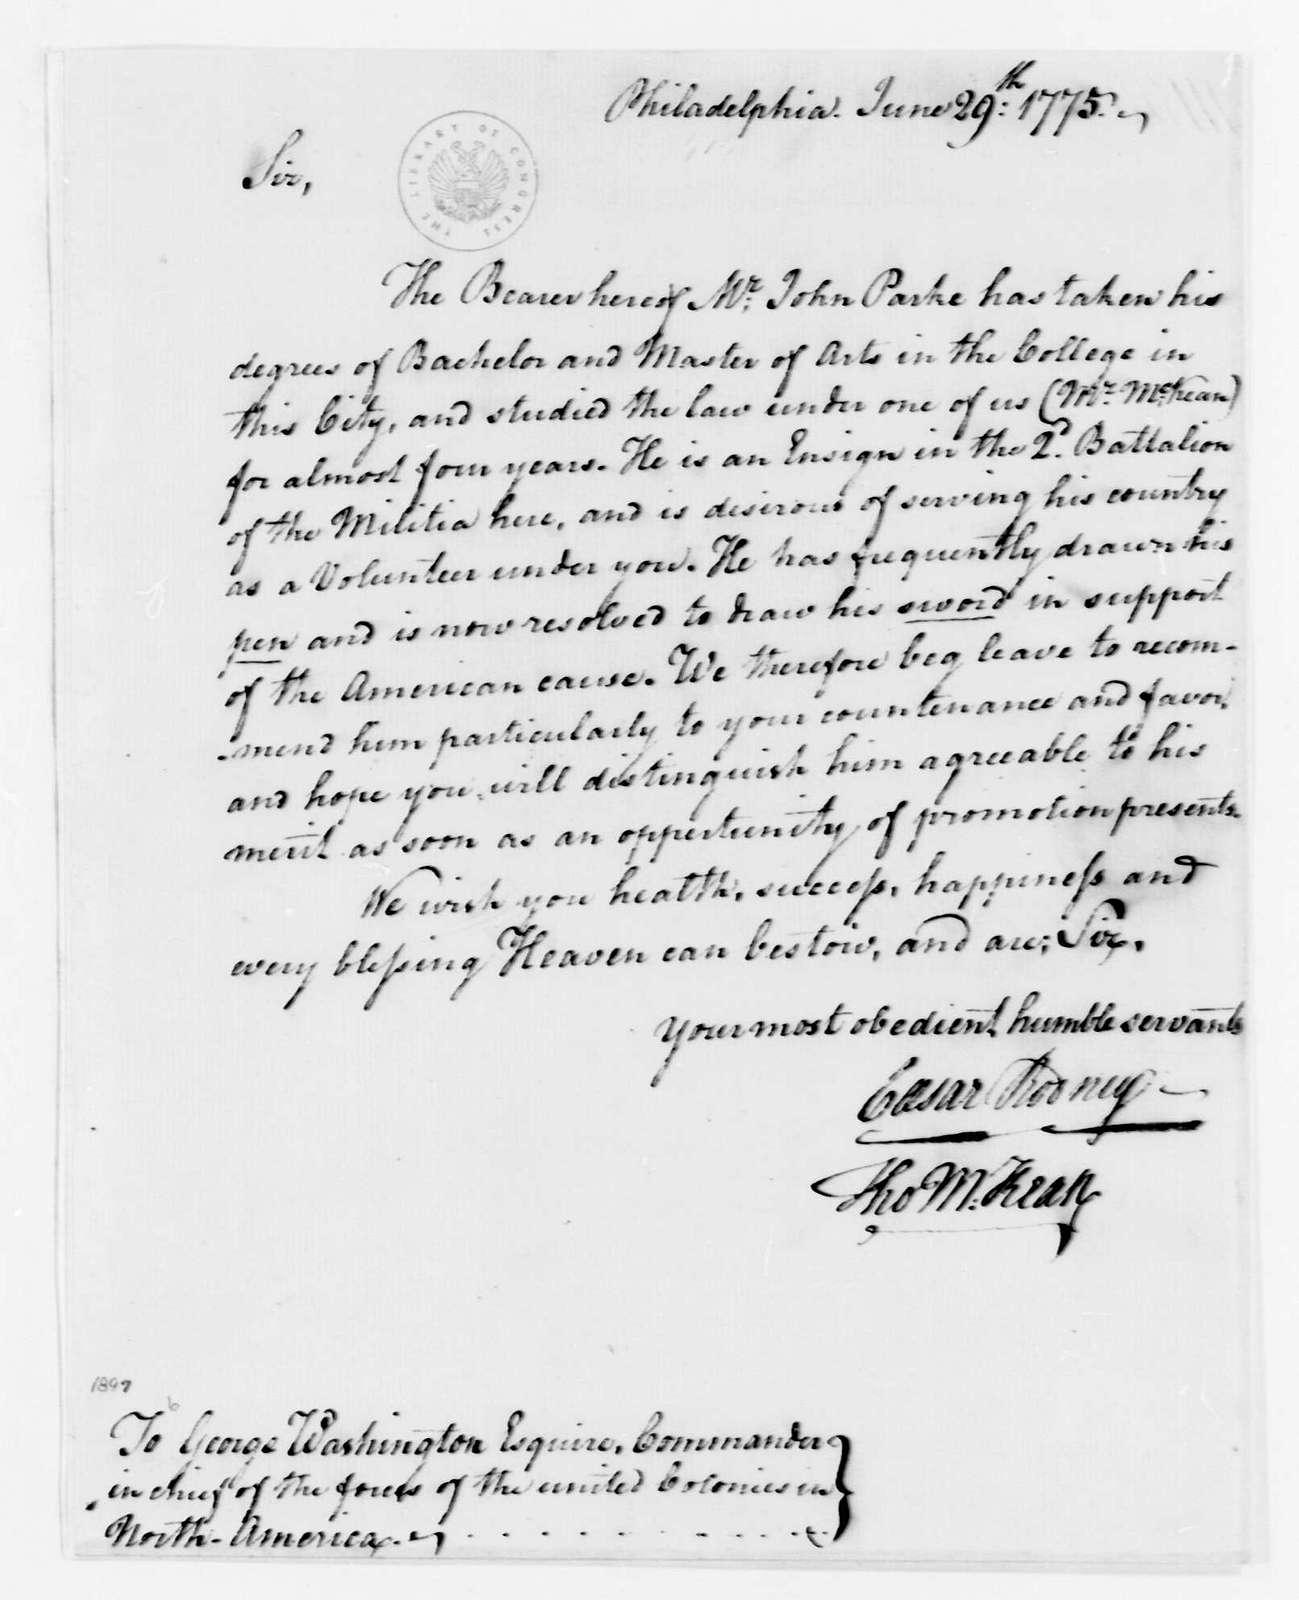 George Washington Papers, Series 4, General Correspondence: Caesar Rodney and Thomas McKean to George Washington, June 29, 1775, Recommendation of John Parke